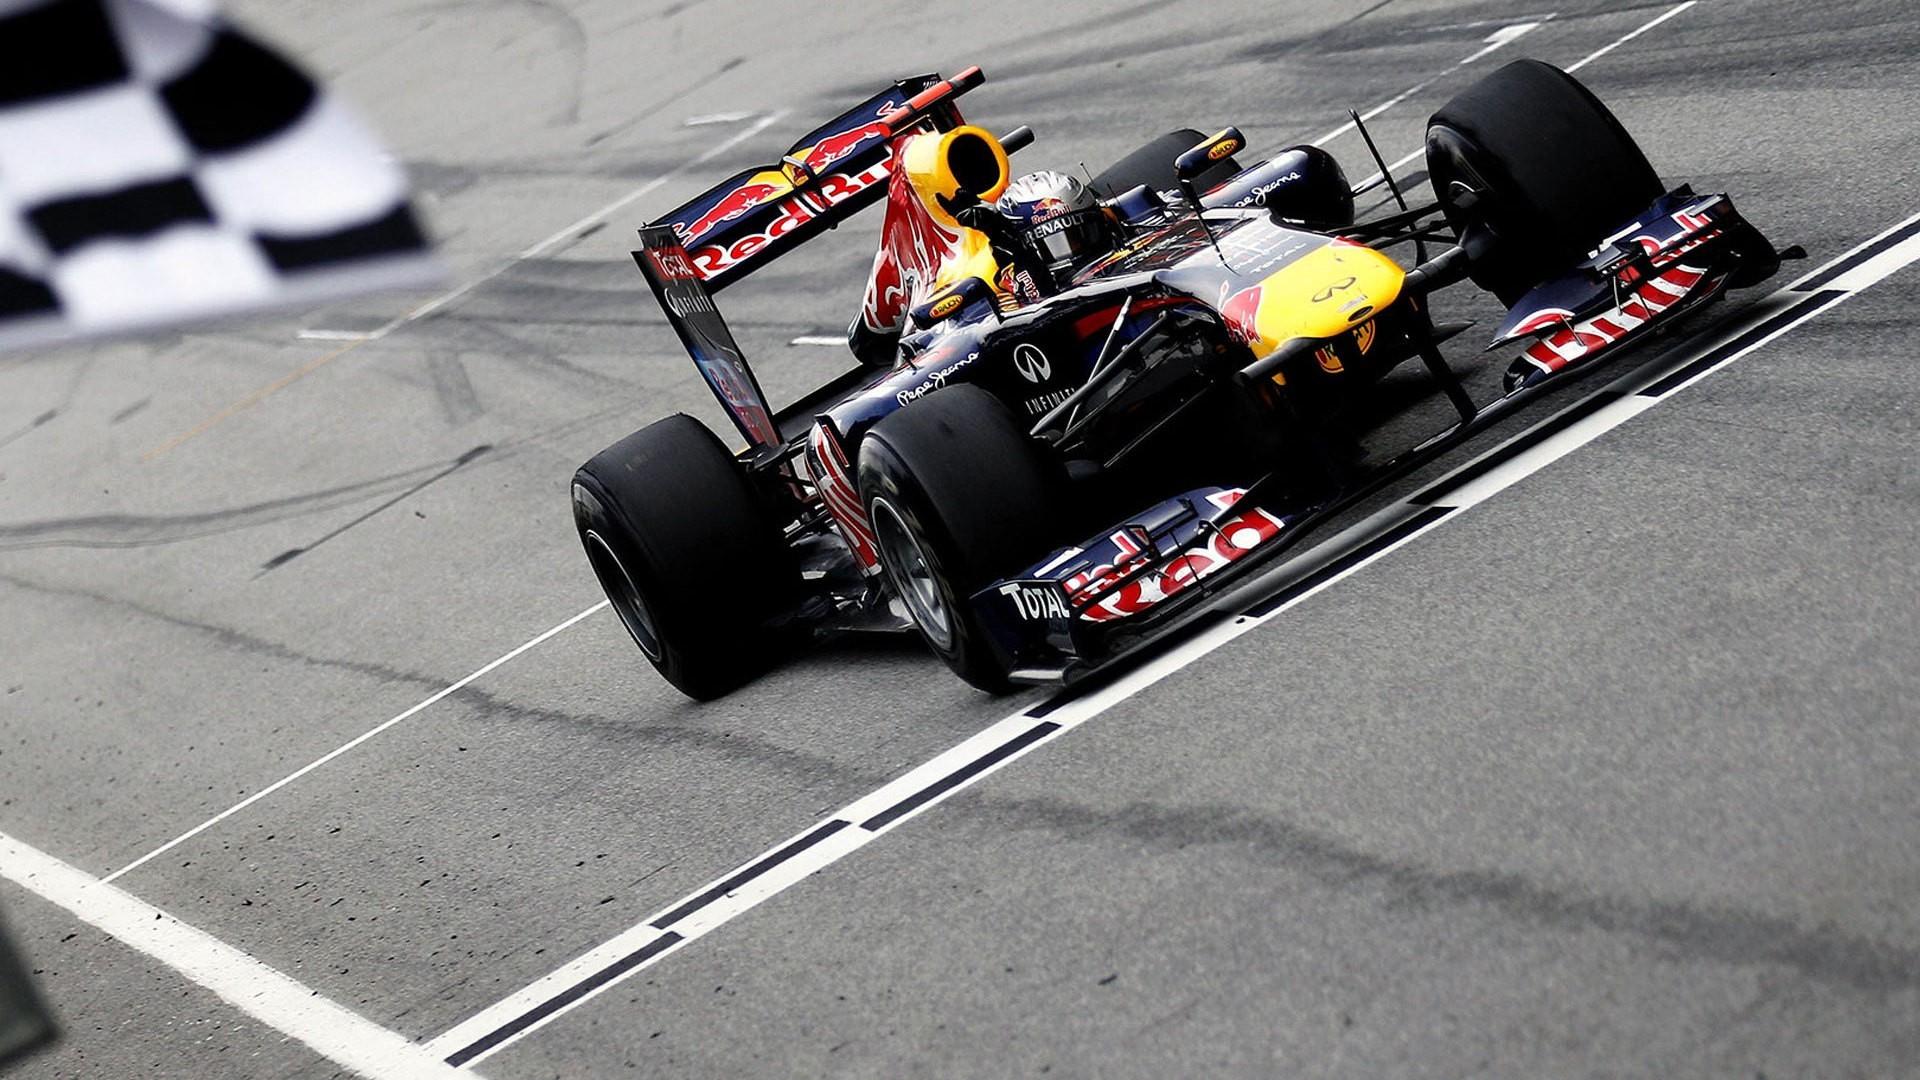 Wallpaper Kendaraan Mewarnai Selektif Formula 1 Red Bull Racing